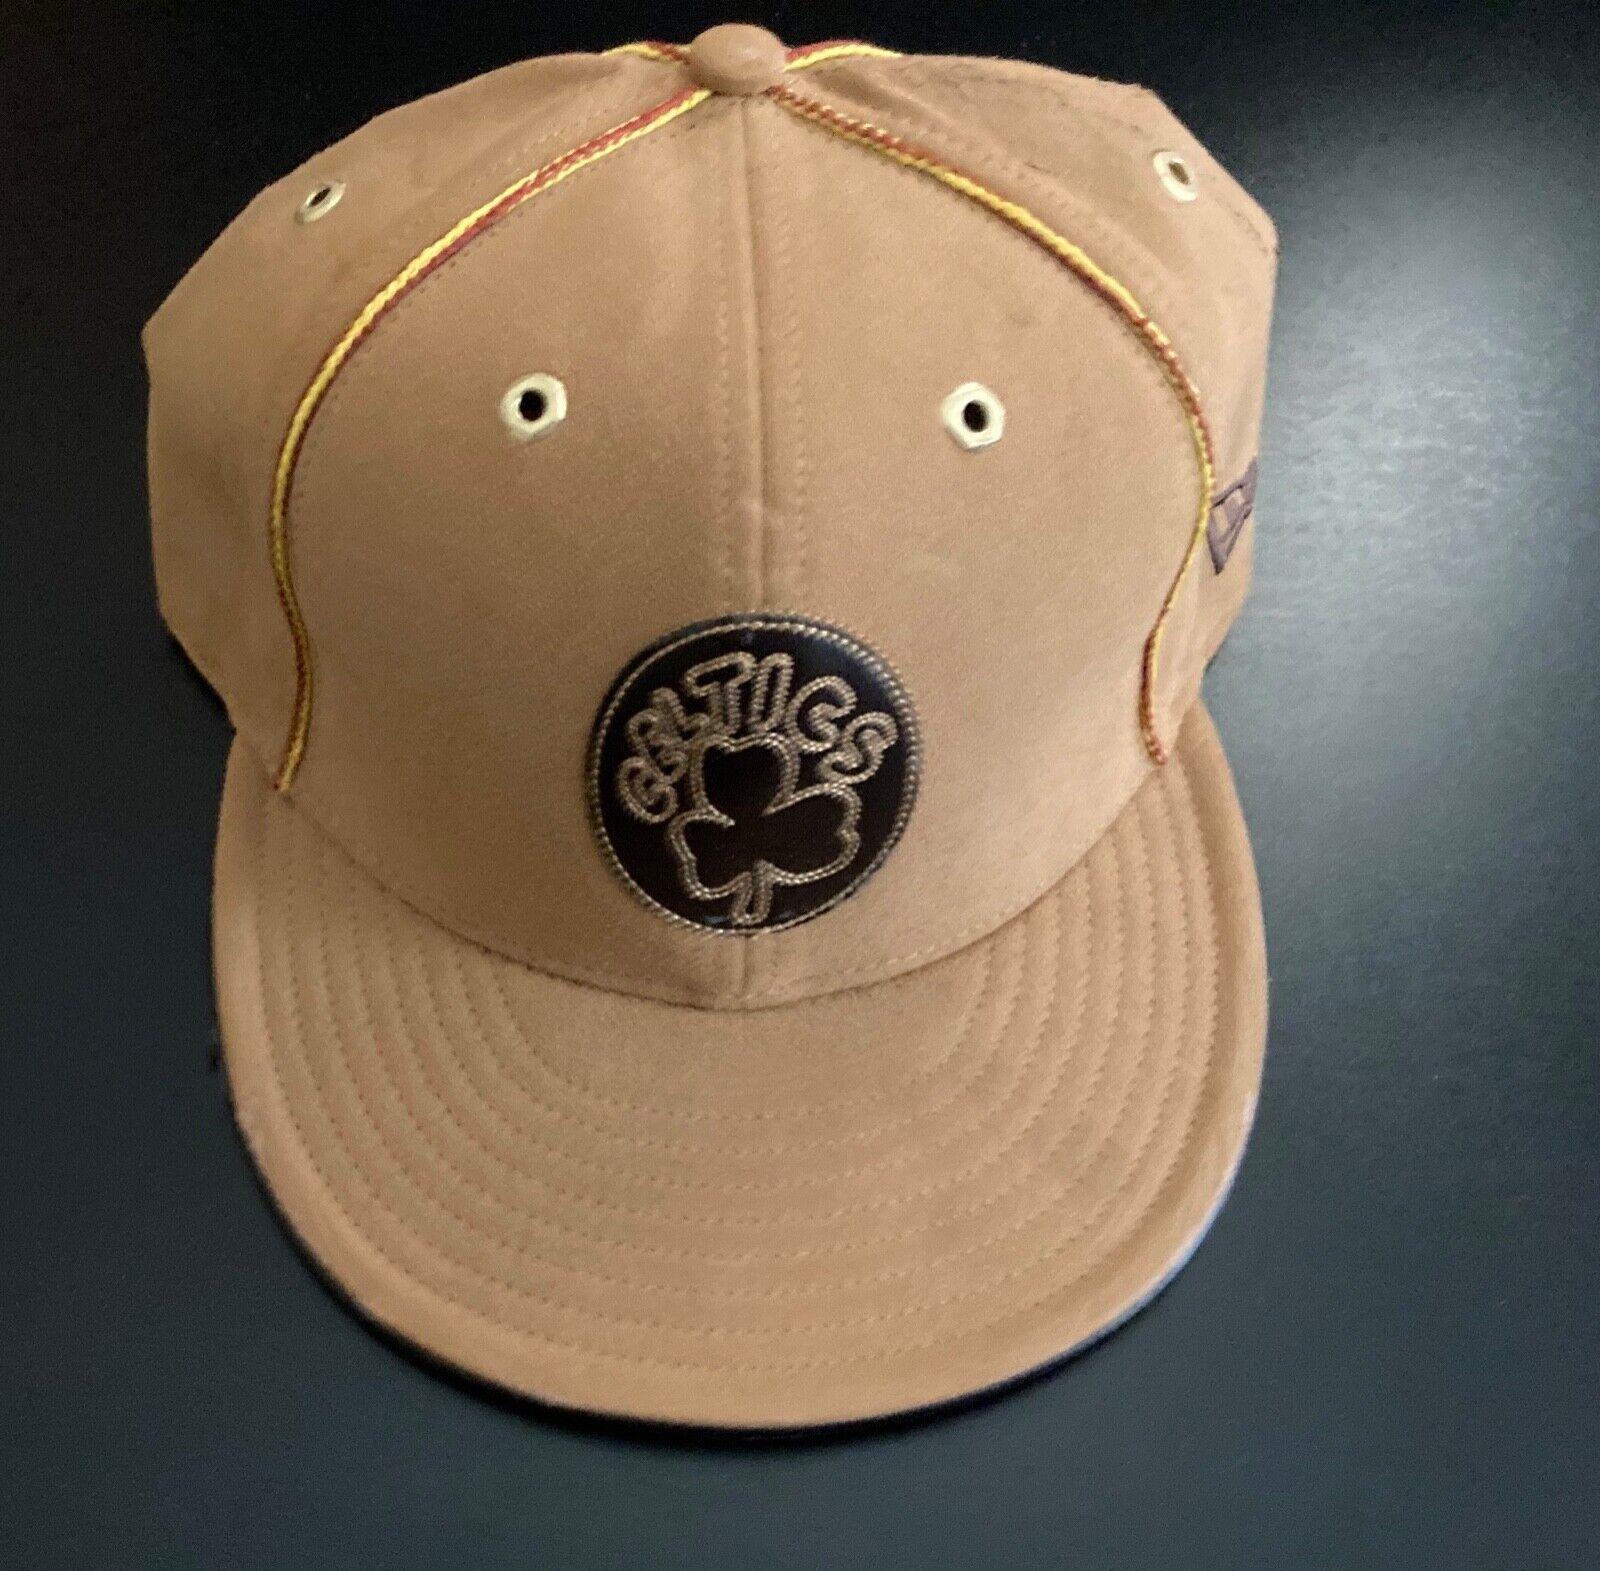 boston celtics nba baseball cap hat size